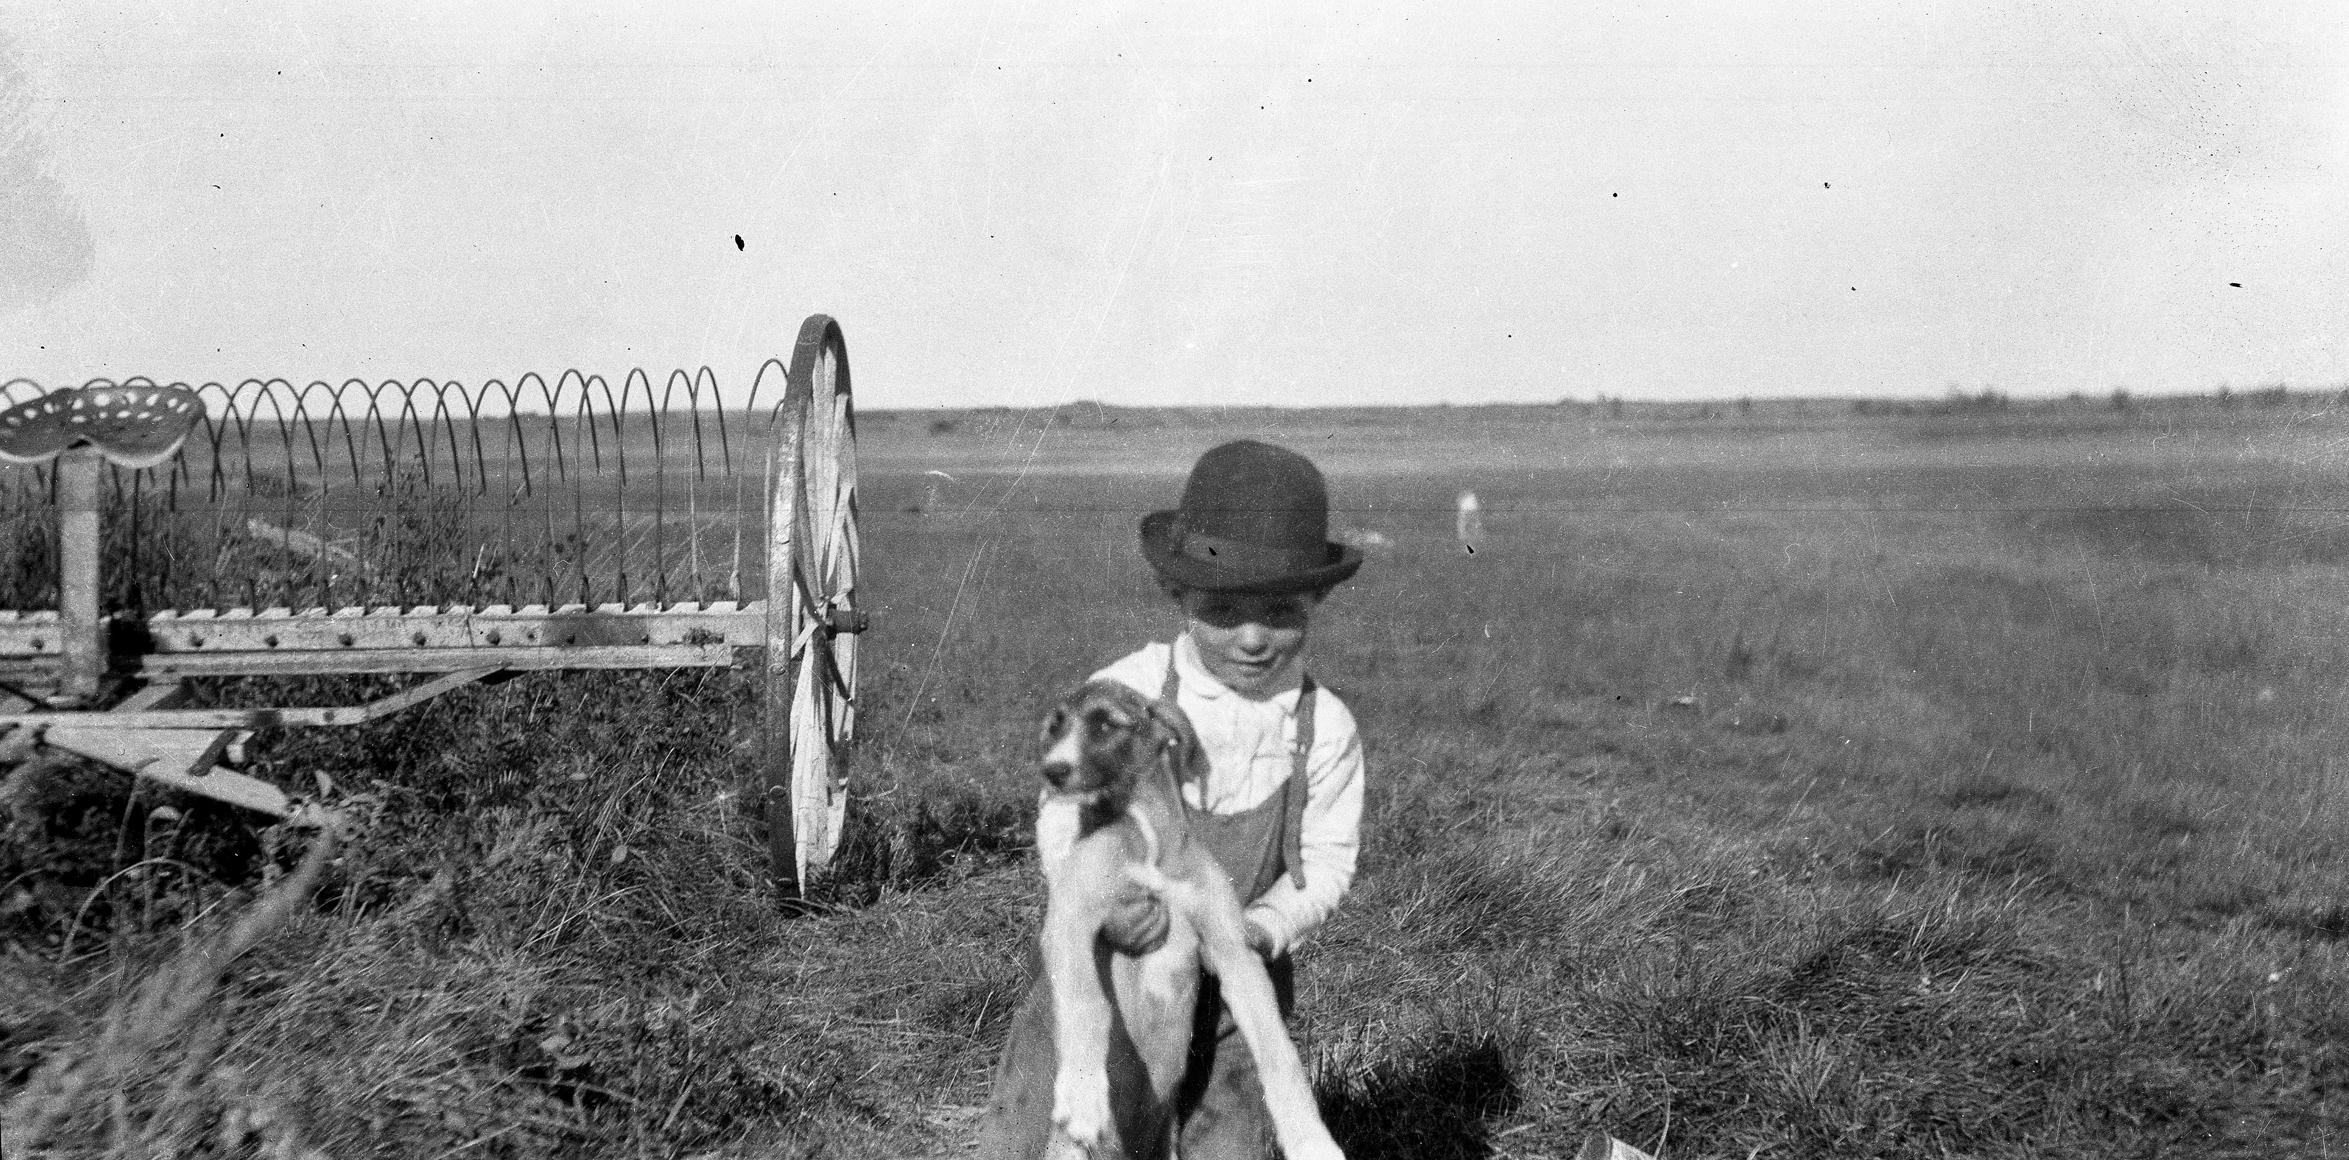 Image courtesy of SEITIES Studioc.1920-30 by Violet Pearl LeGrandeur